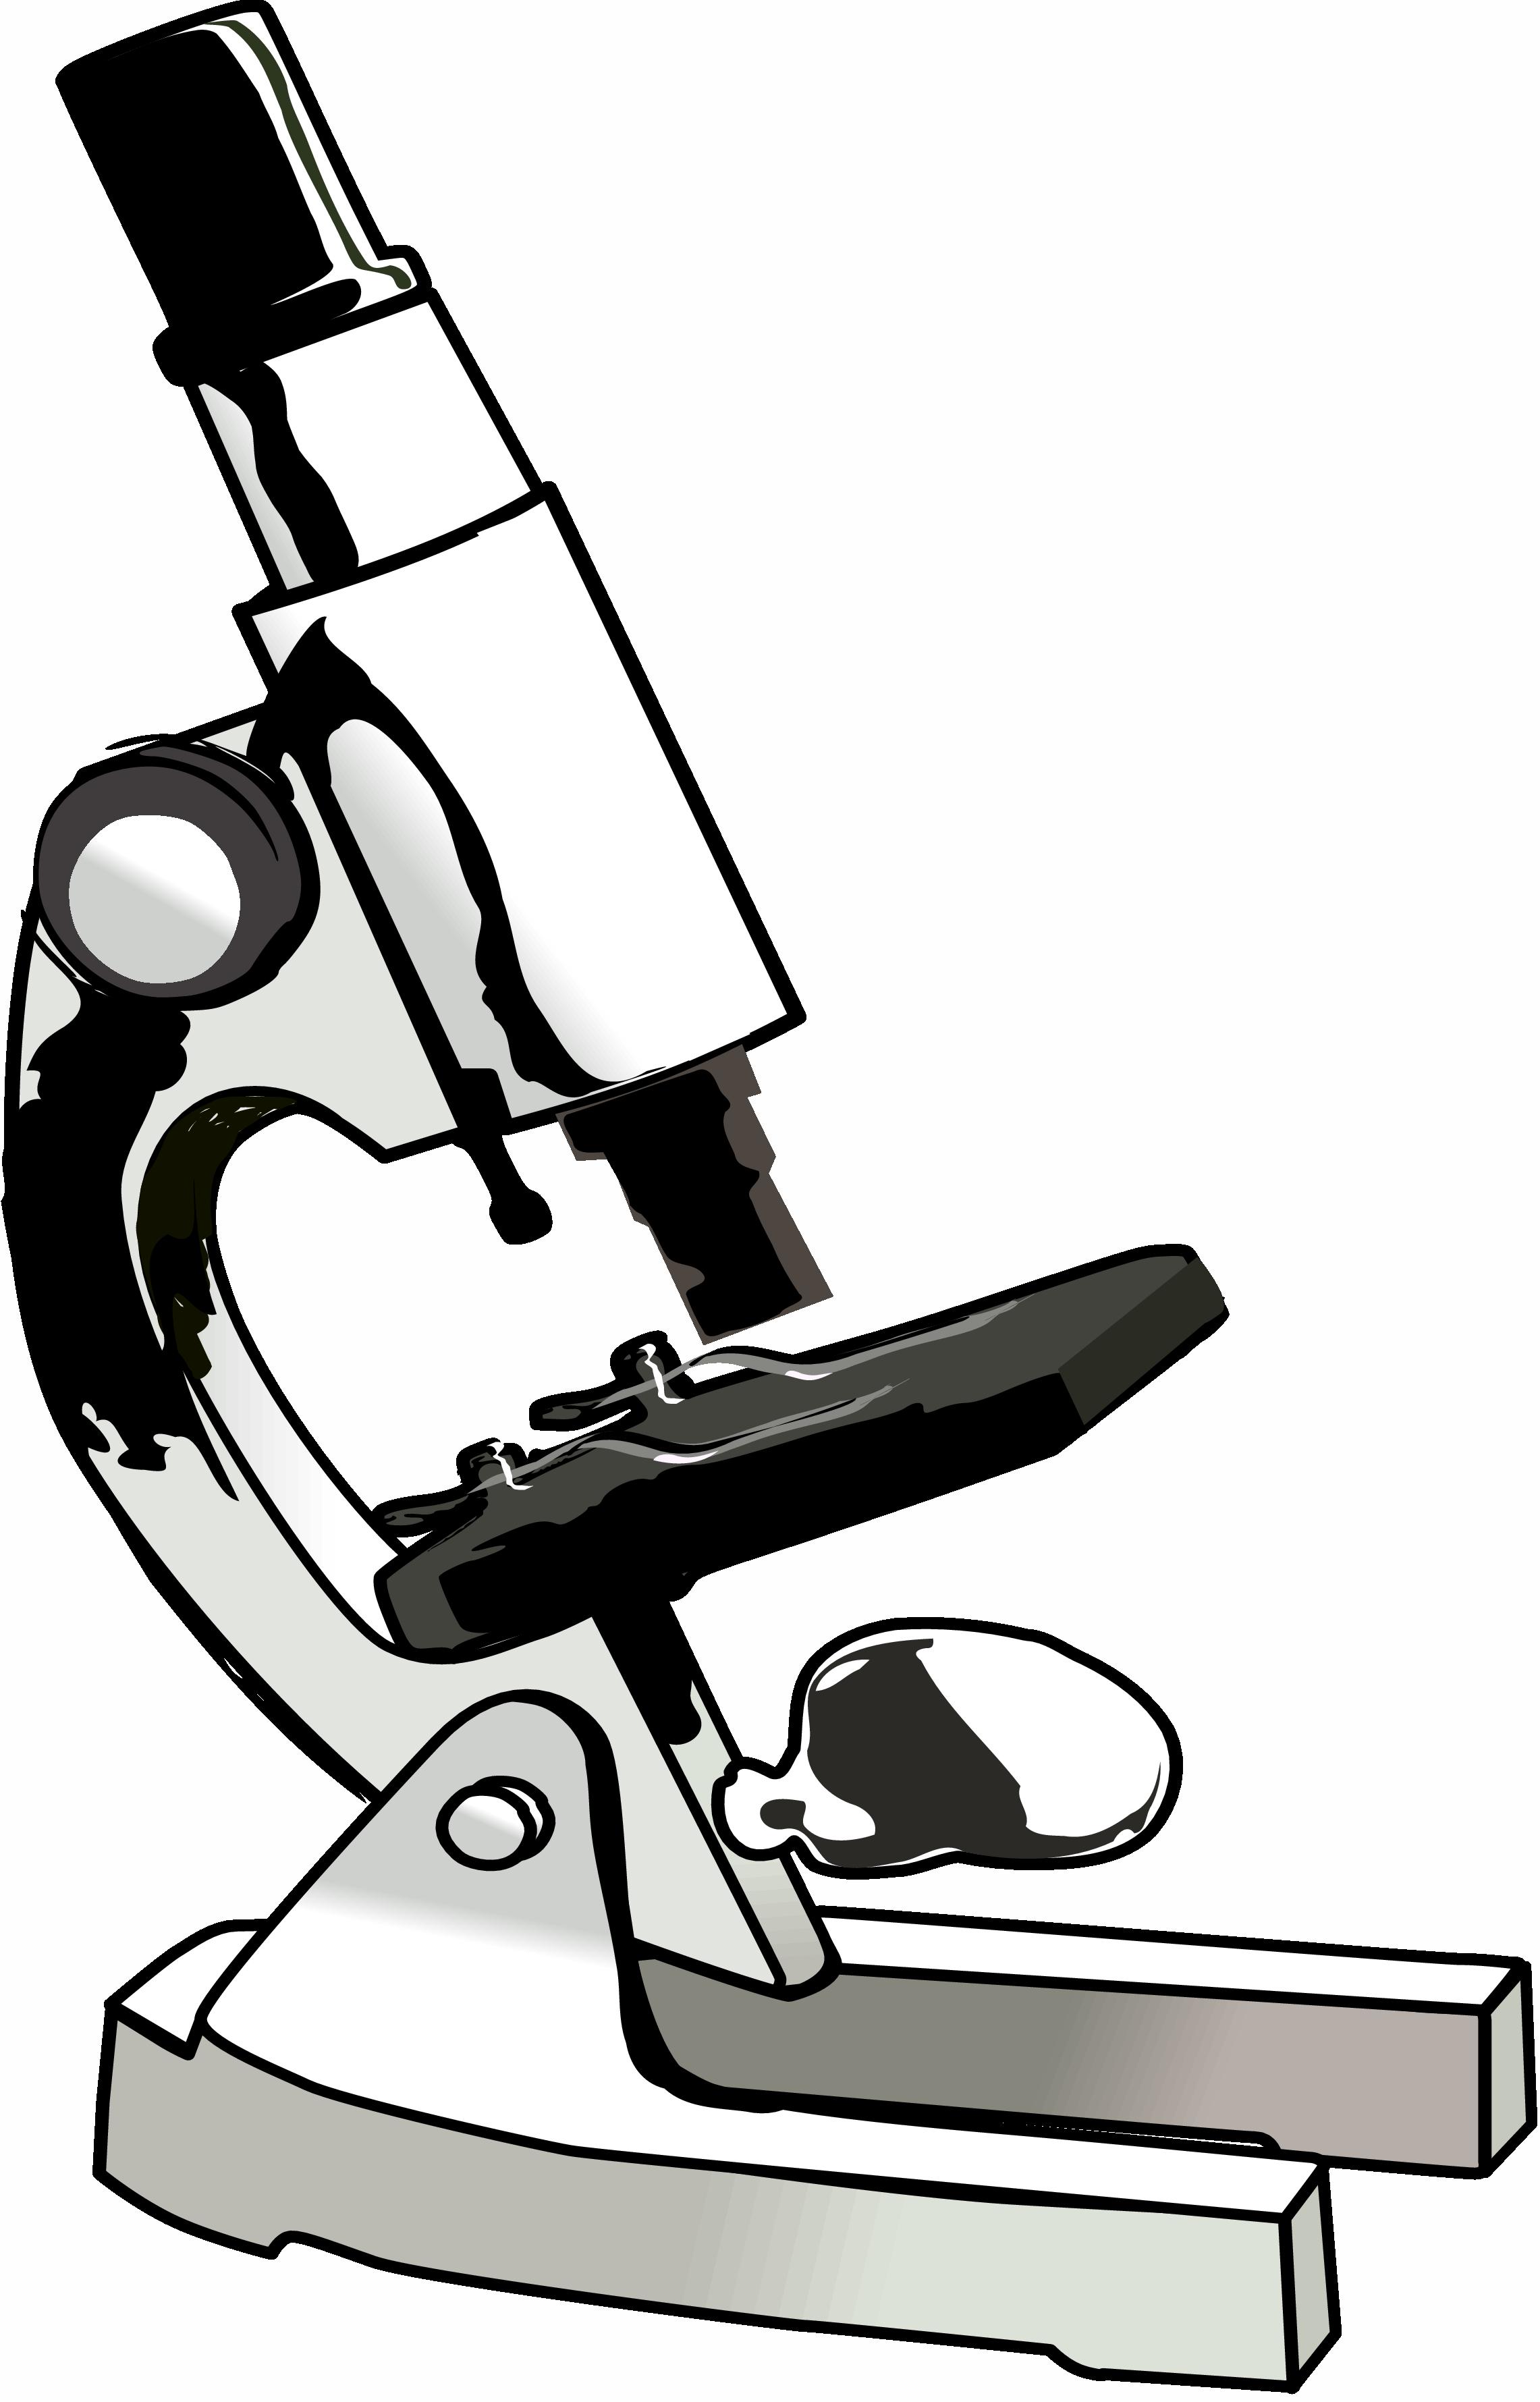 Microscope Lens Diagram